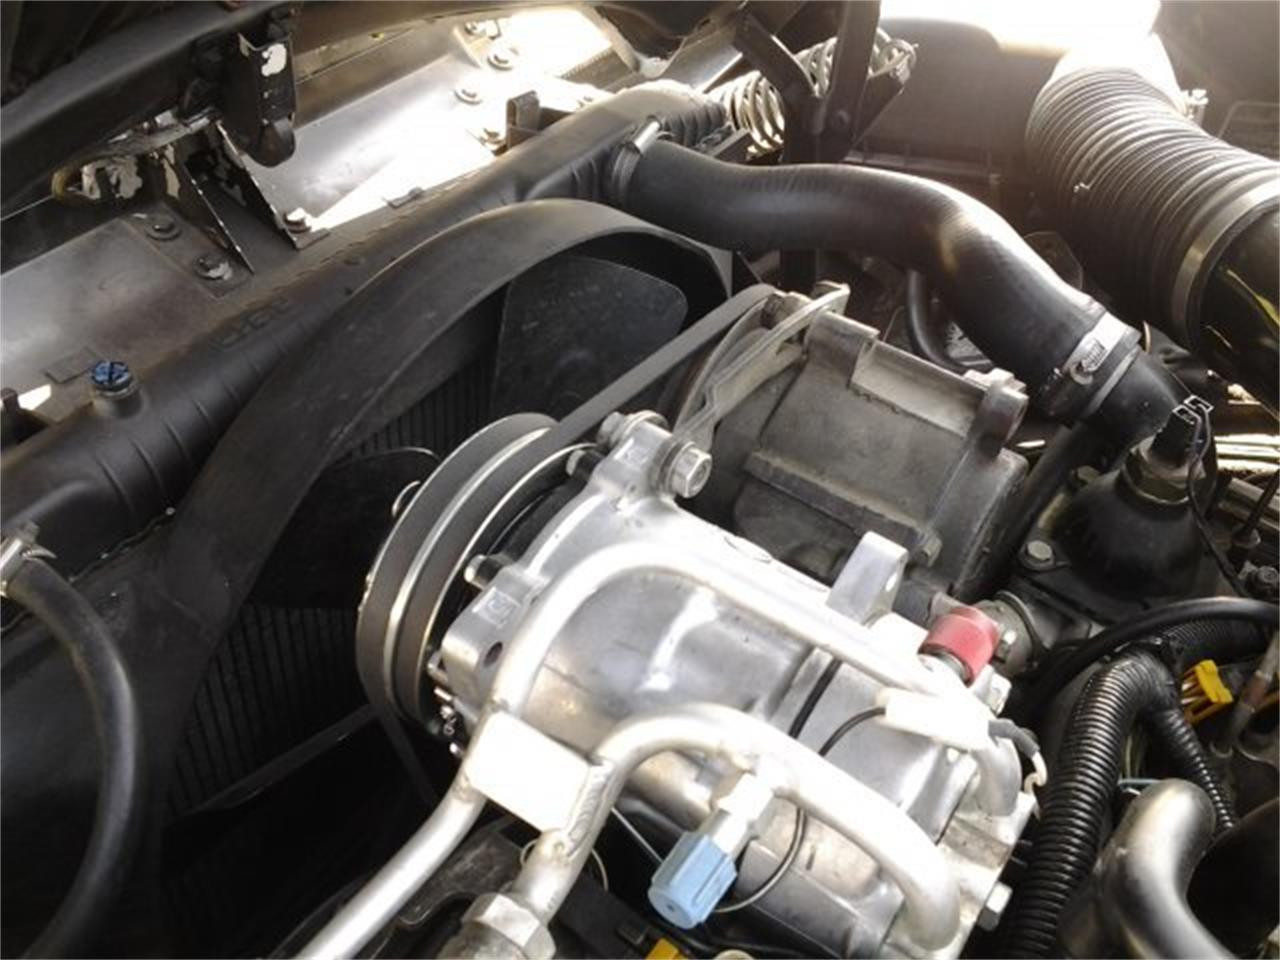 1987 Rolls Royce Corniche Ii For Sale Cc 1158098 Fuel Pump Large Picture Of 87 Otle